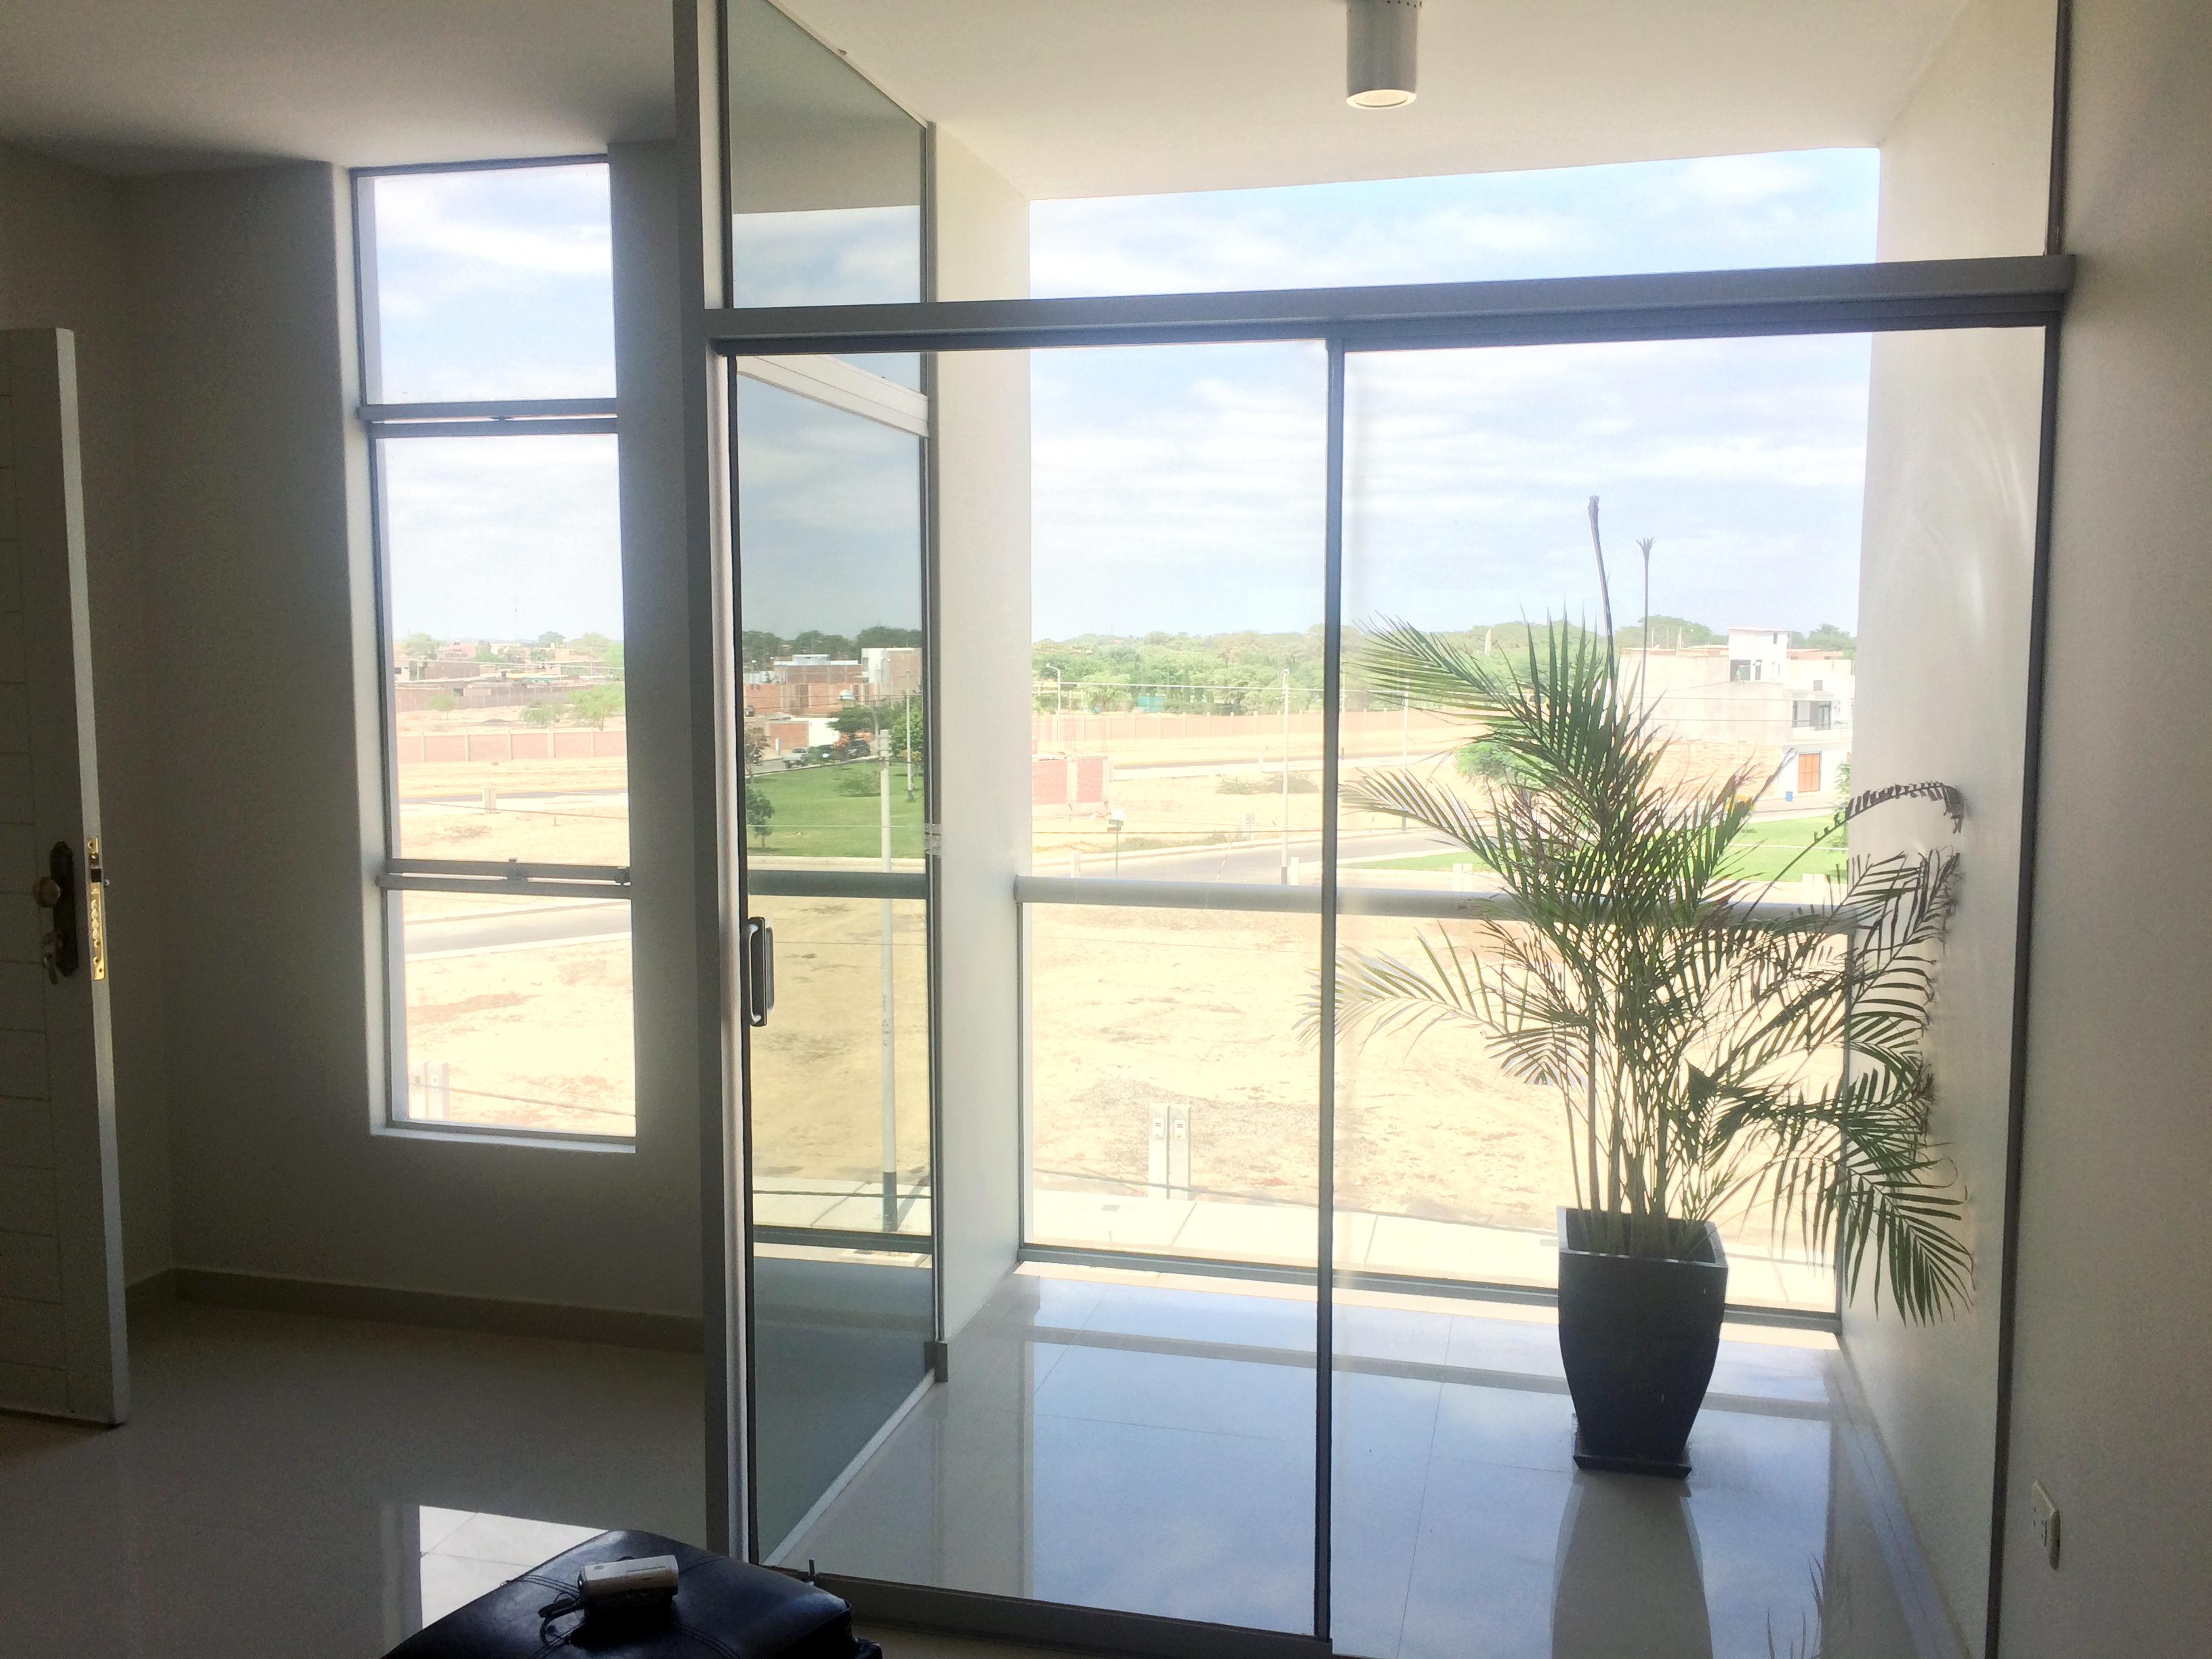 Alquiler ja constructores for Decoracion balcon departamento